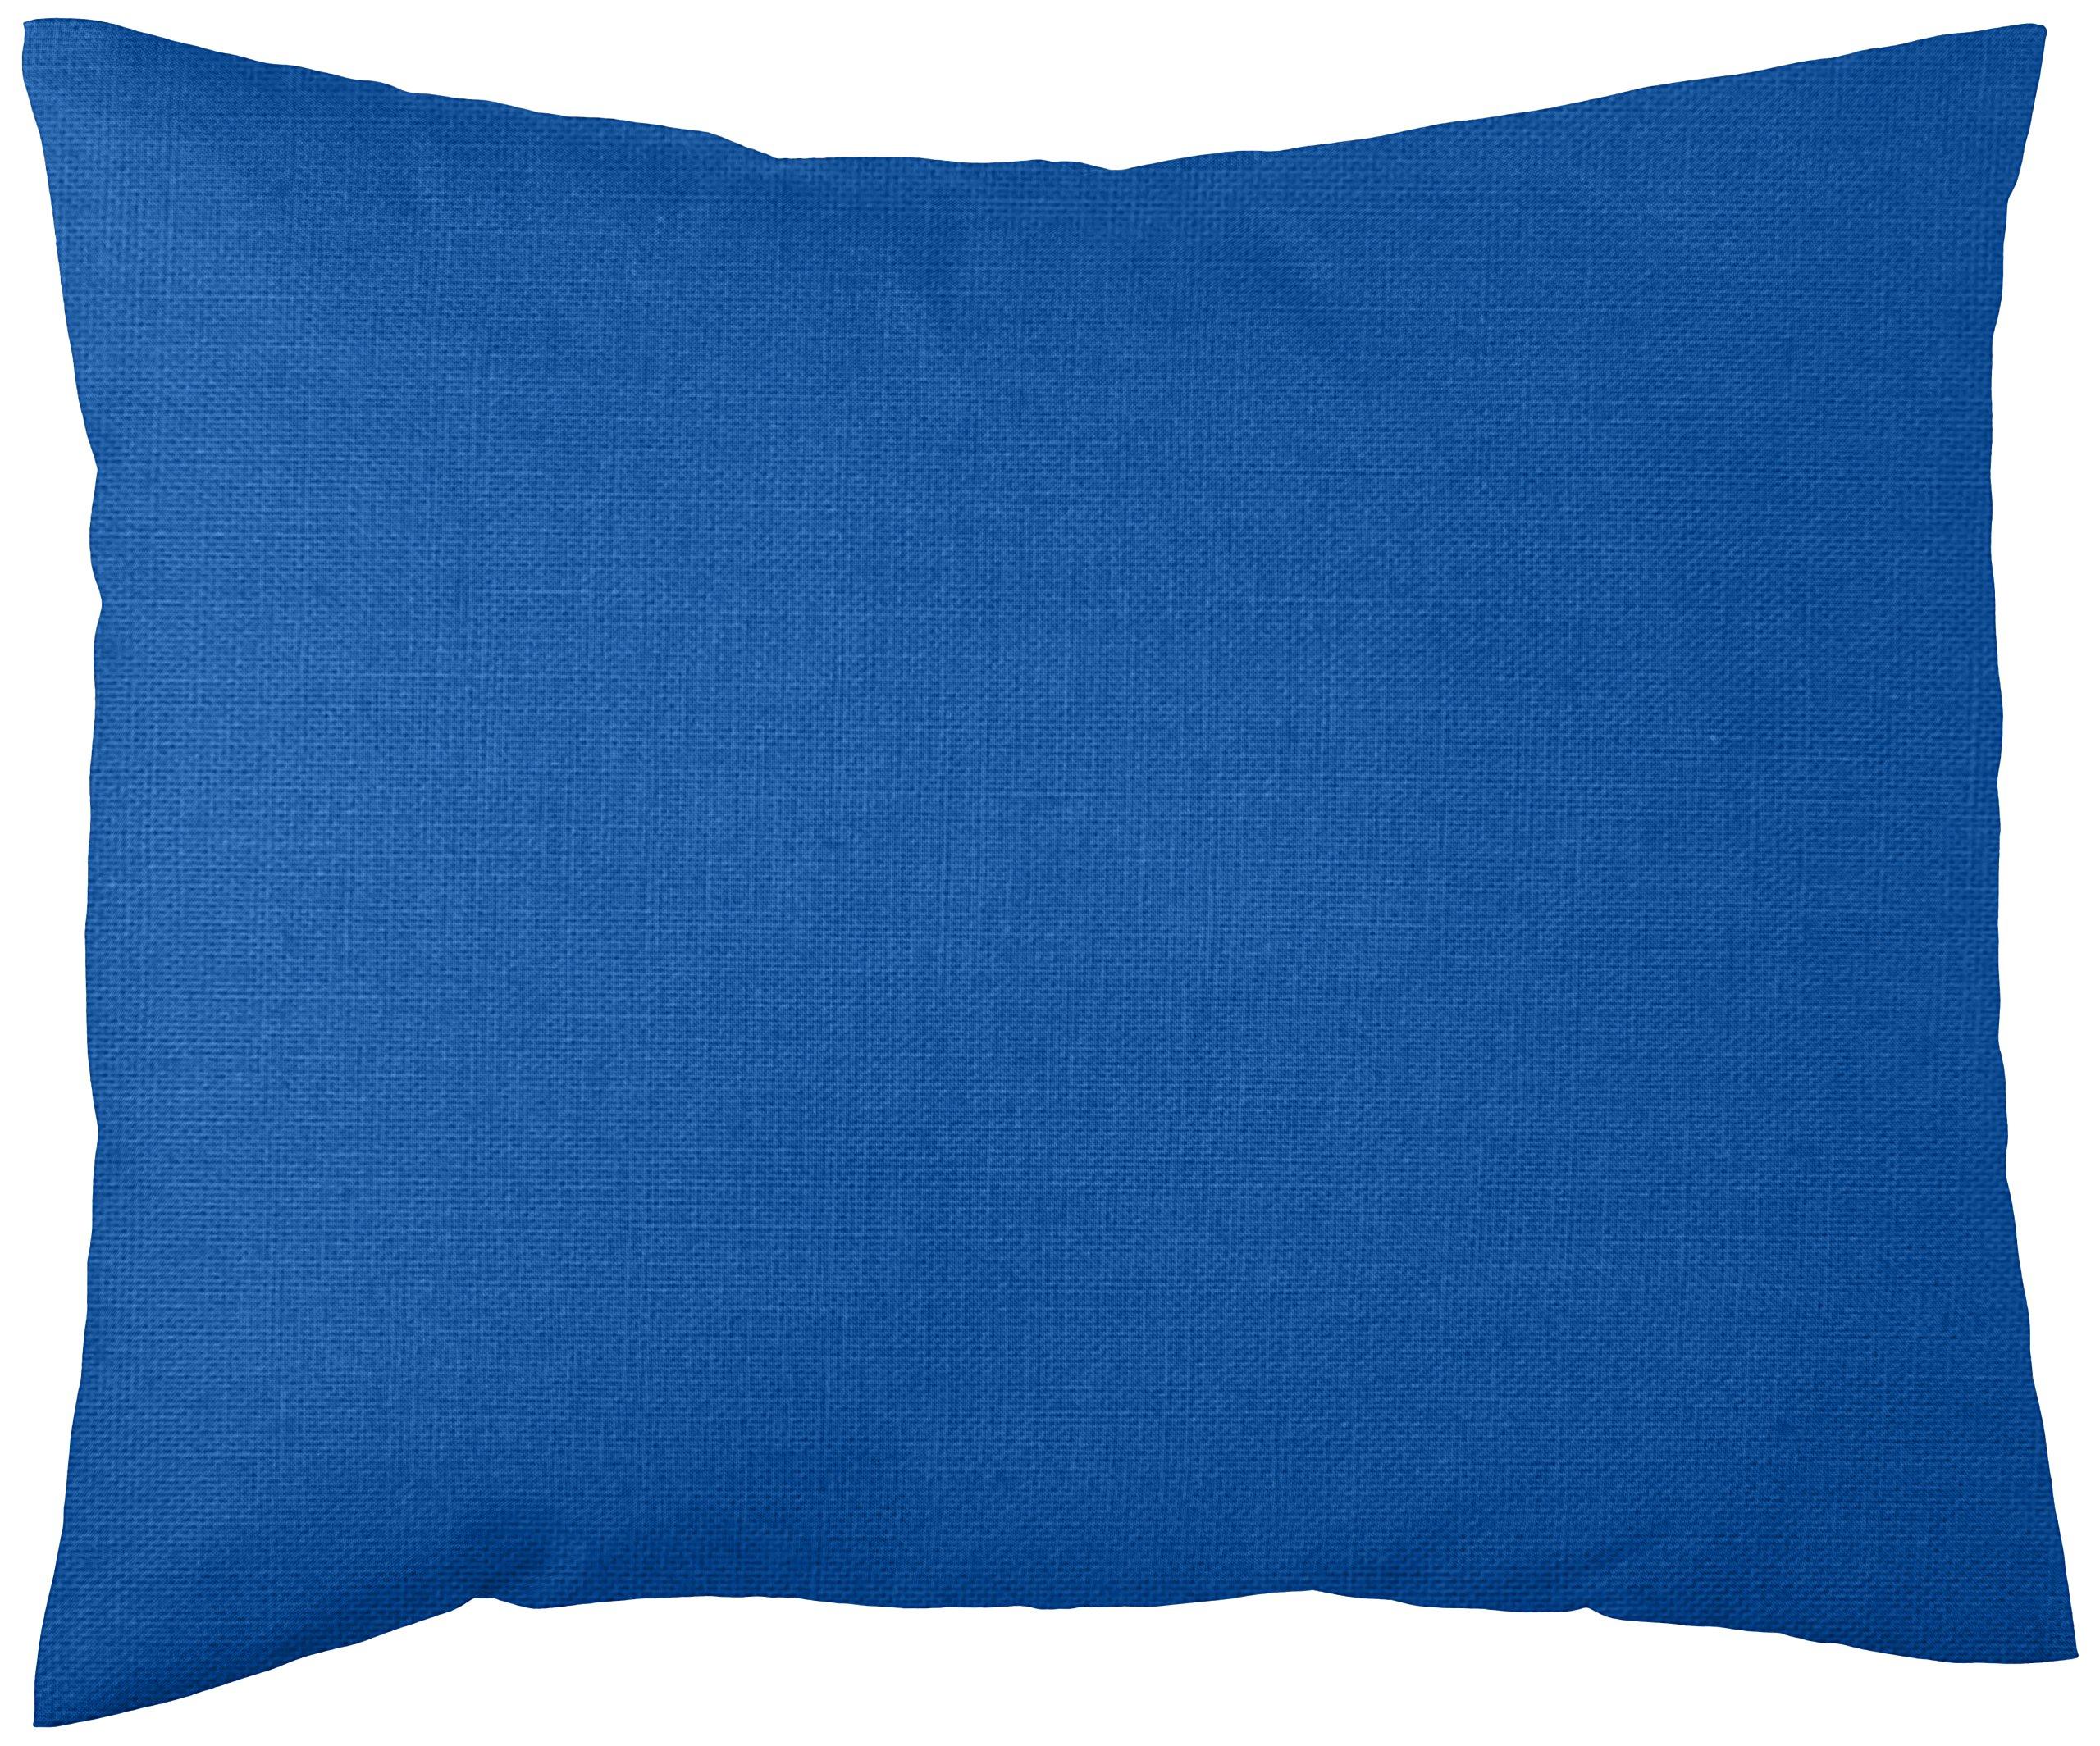 Amazon Com Sheetworld Comfy Travel Pillow Case 100